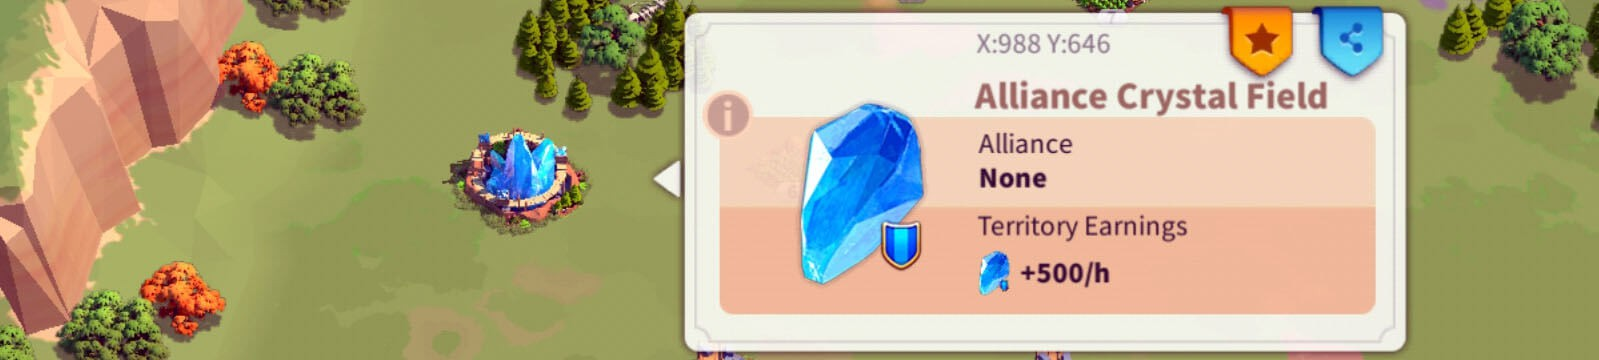 Alliance Crystal Field